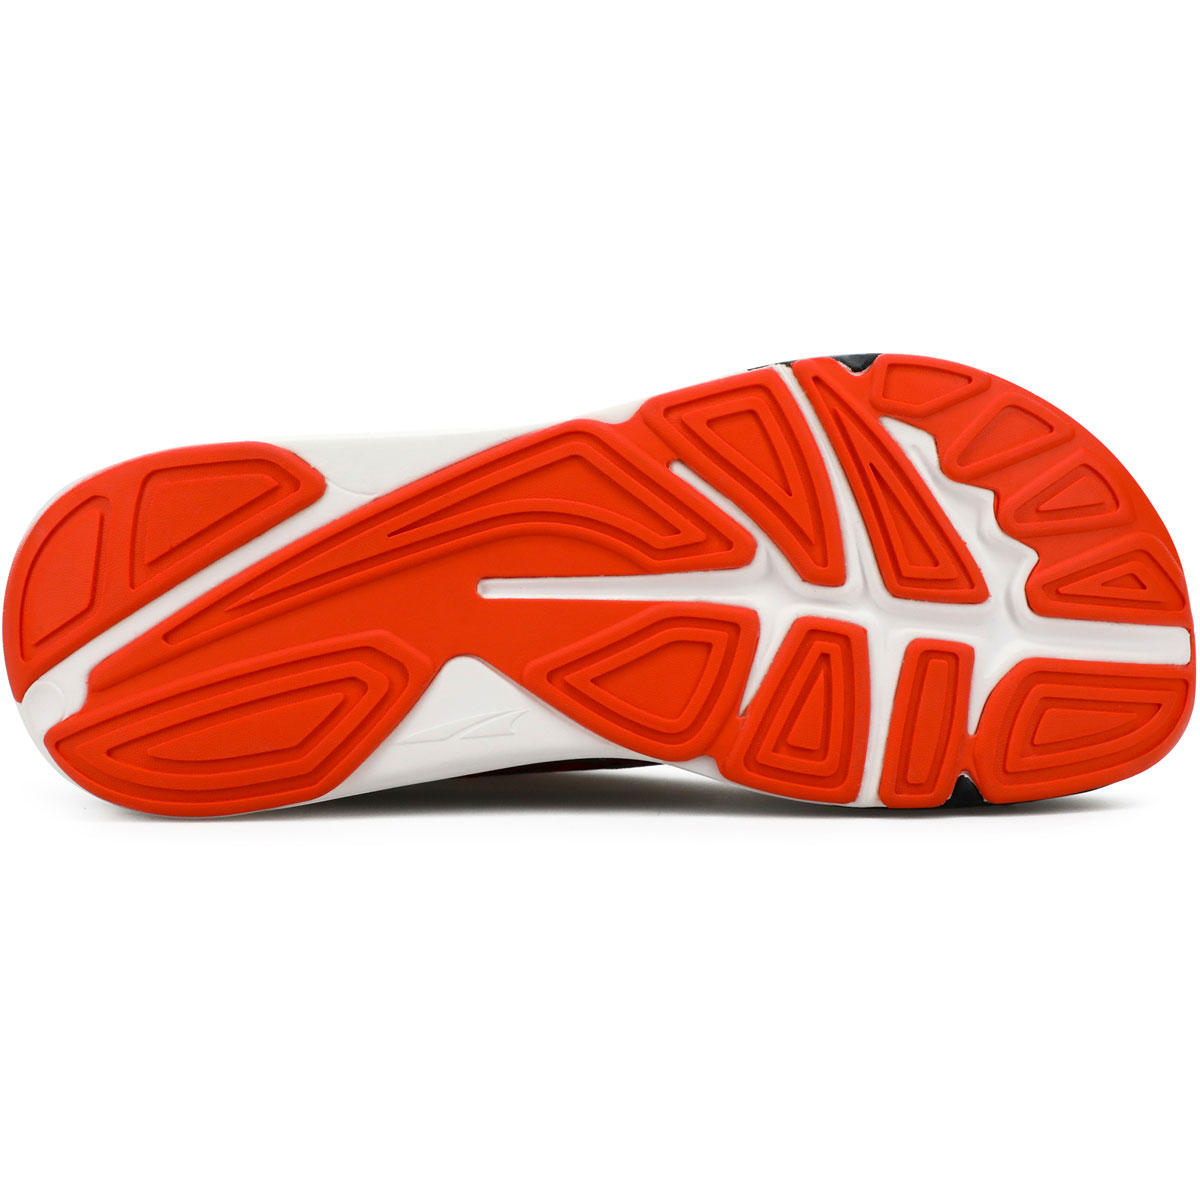 Men's Altra Paradigm 5 Running Shoe - Color: Gray/Orange - Size: 7 - Width: Regular, Gray/Orange, large, image 4